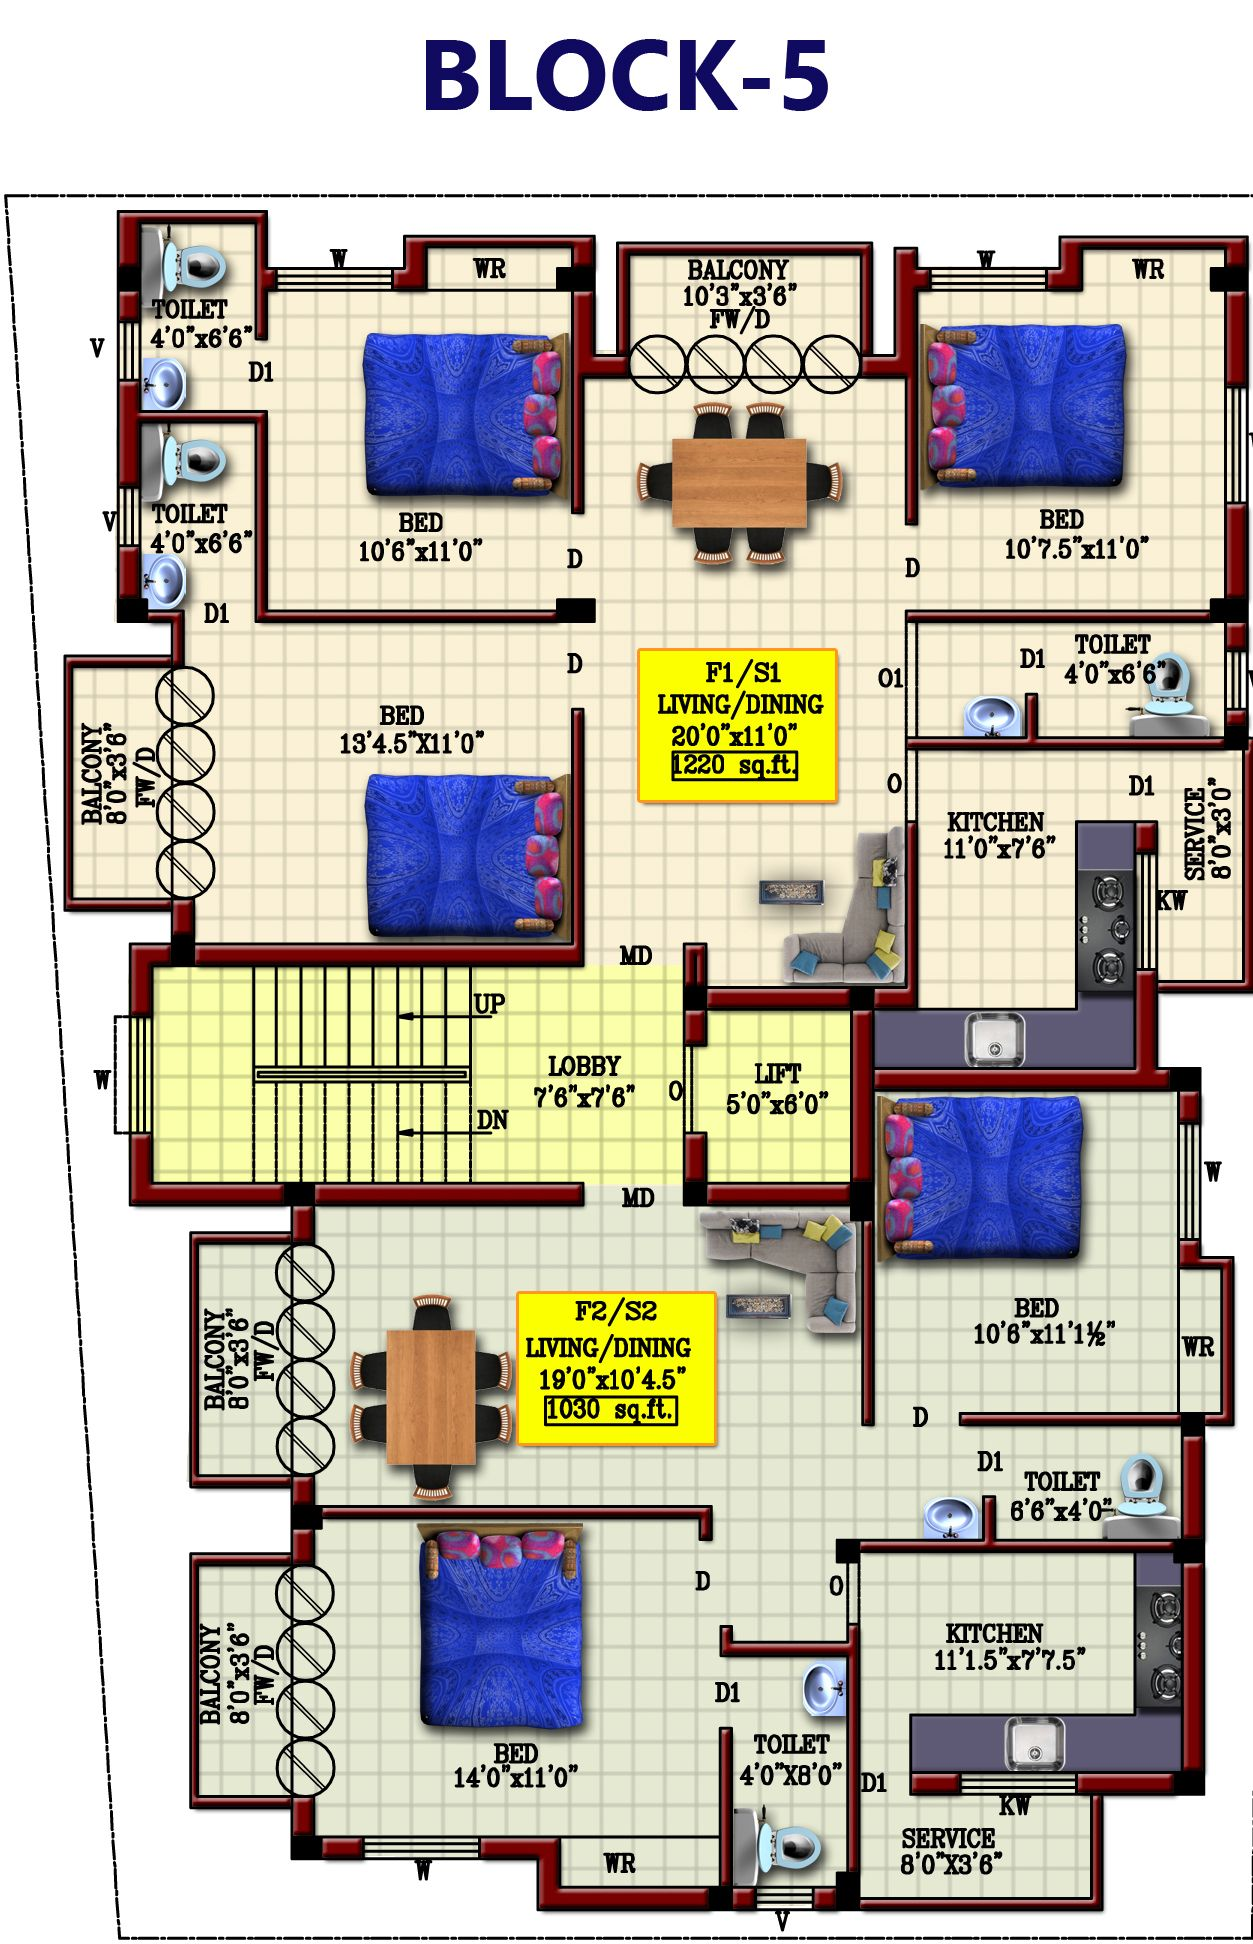 5th Block Floor Plan Of Brisa Flats Apartments Mugalivakkam Chennai Flat Apartment Floor Plans How To Plan